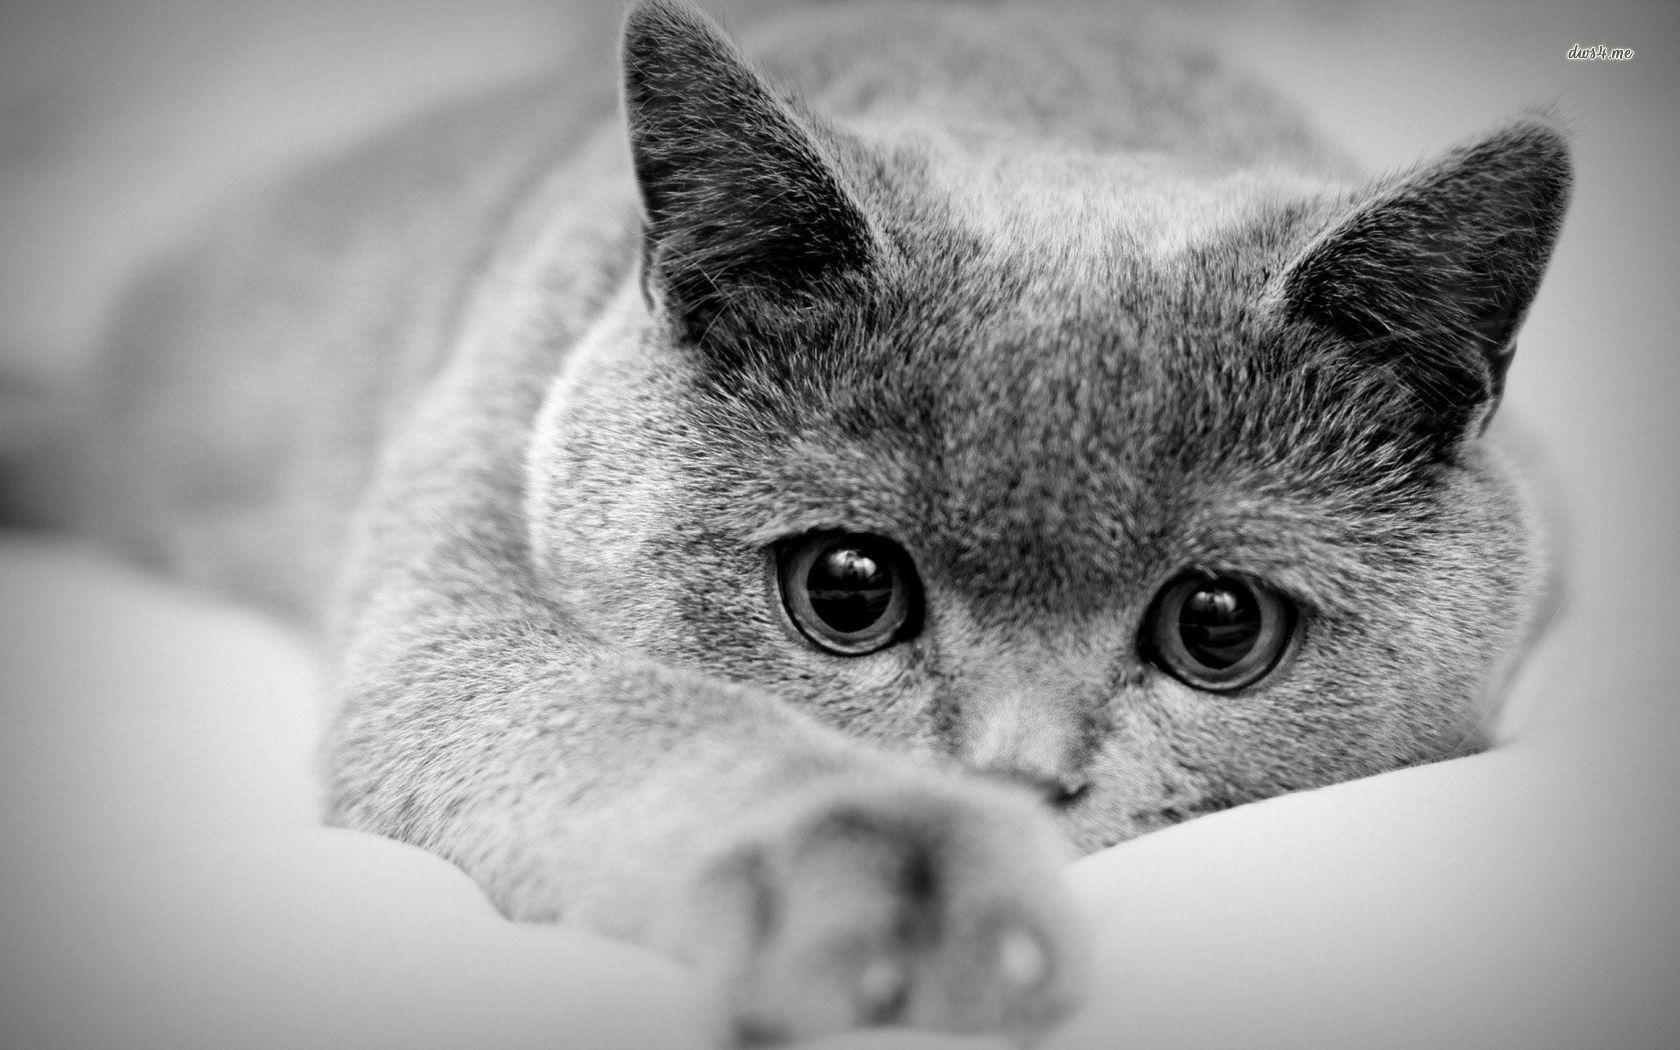 Black and white cat wallpapers wallpaper cave - Kitten wallpaper ...